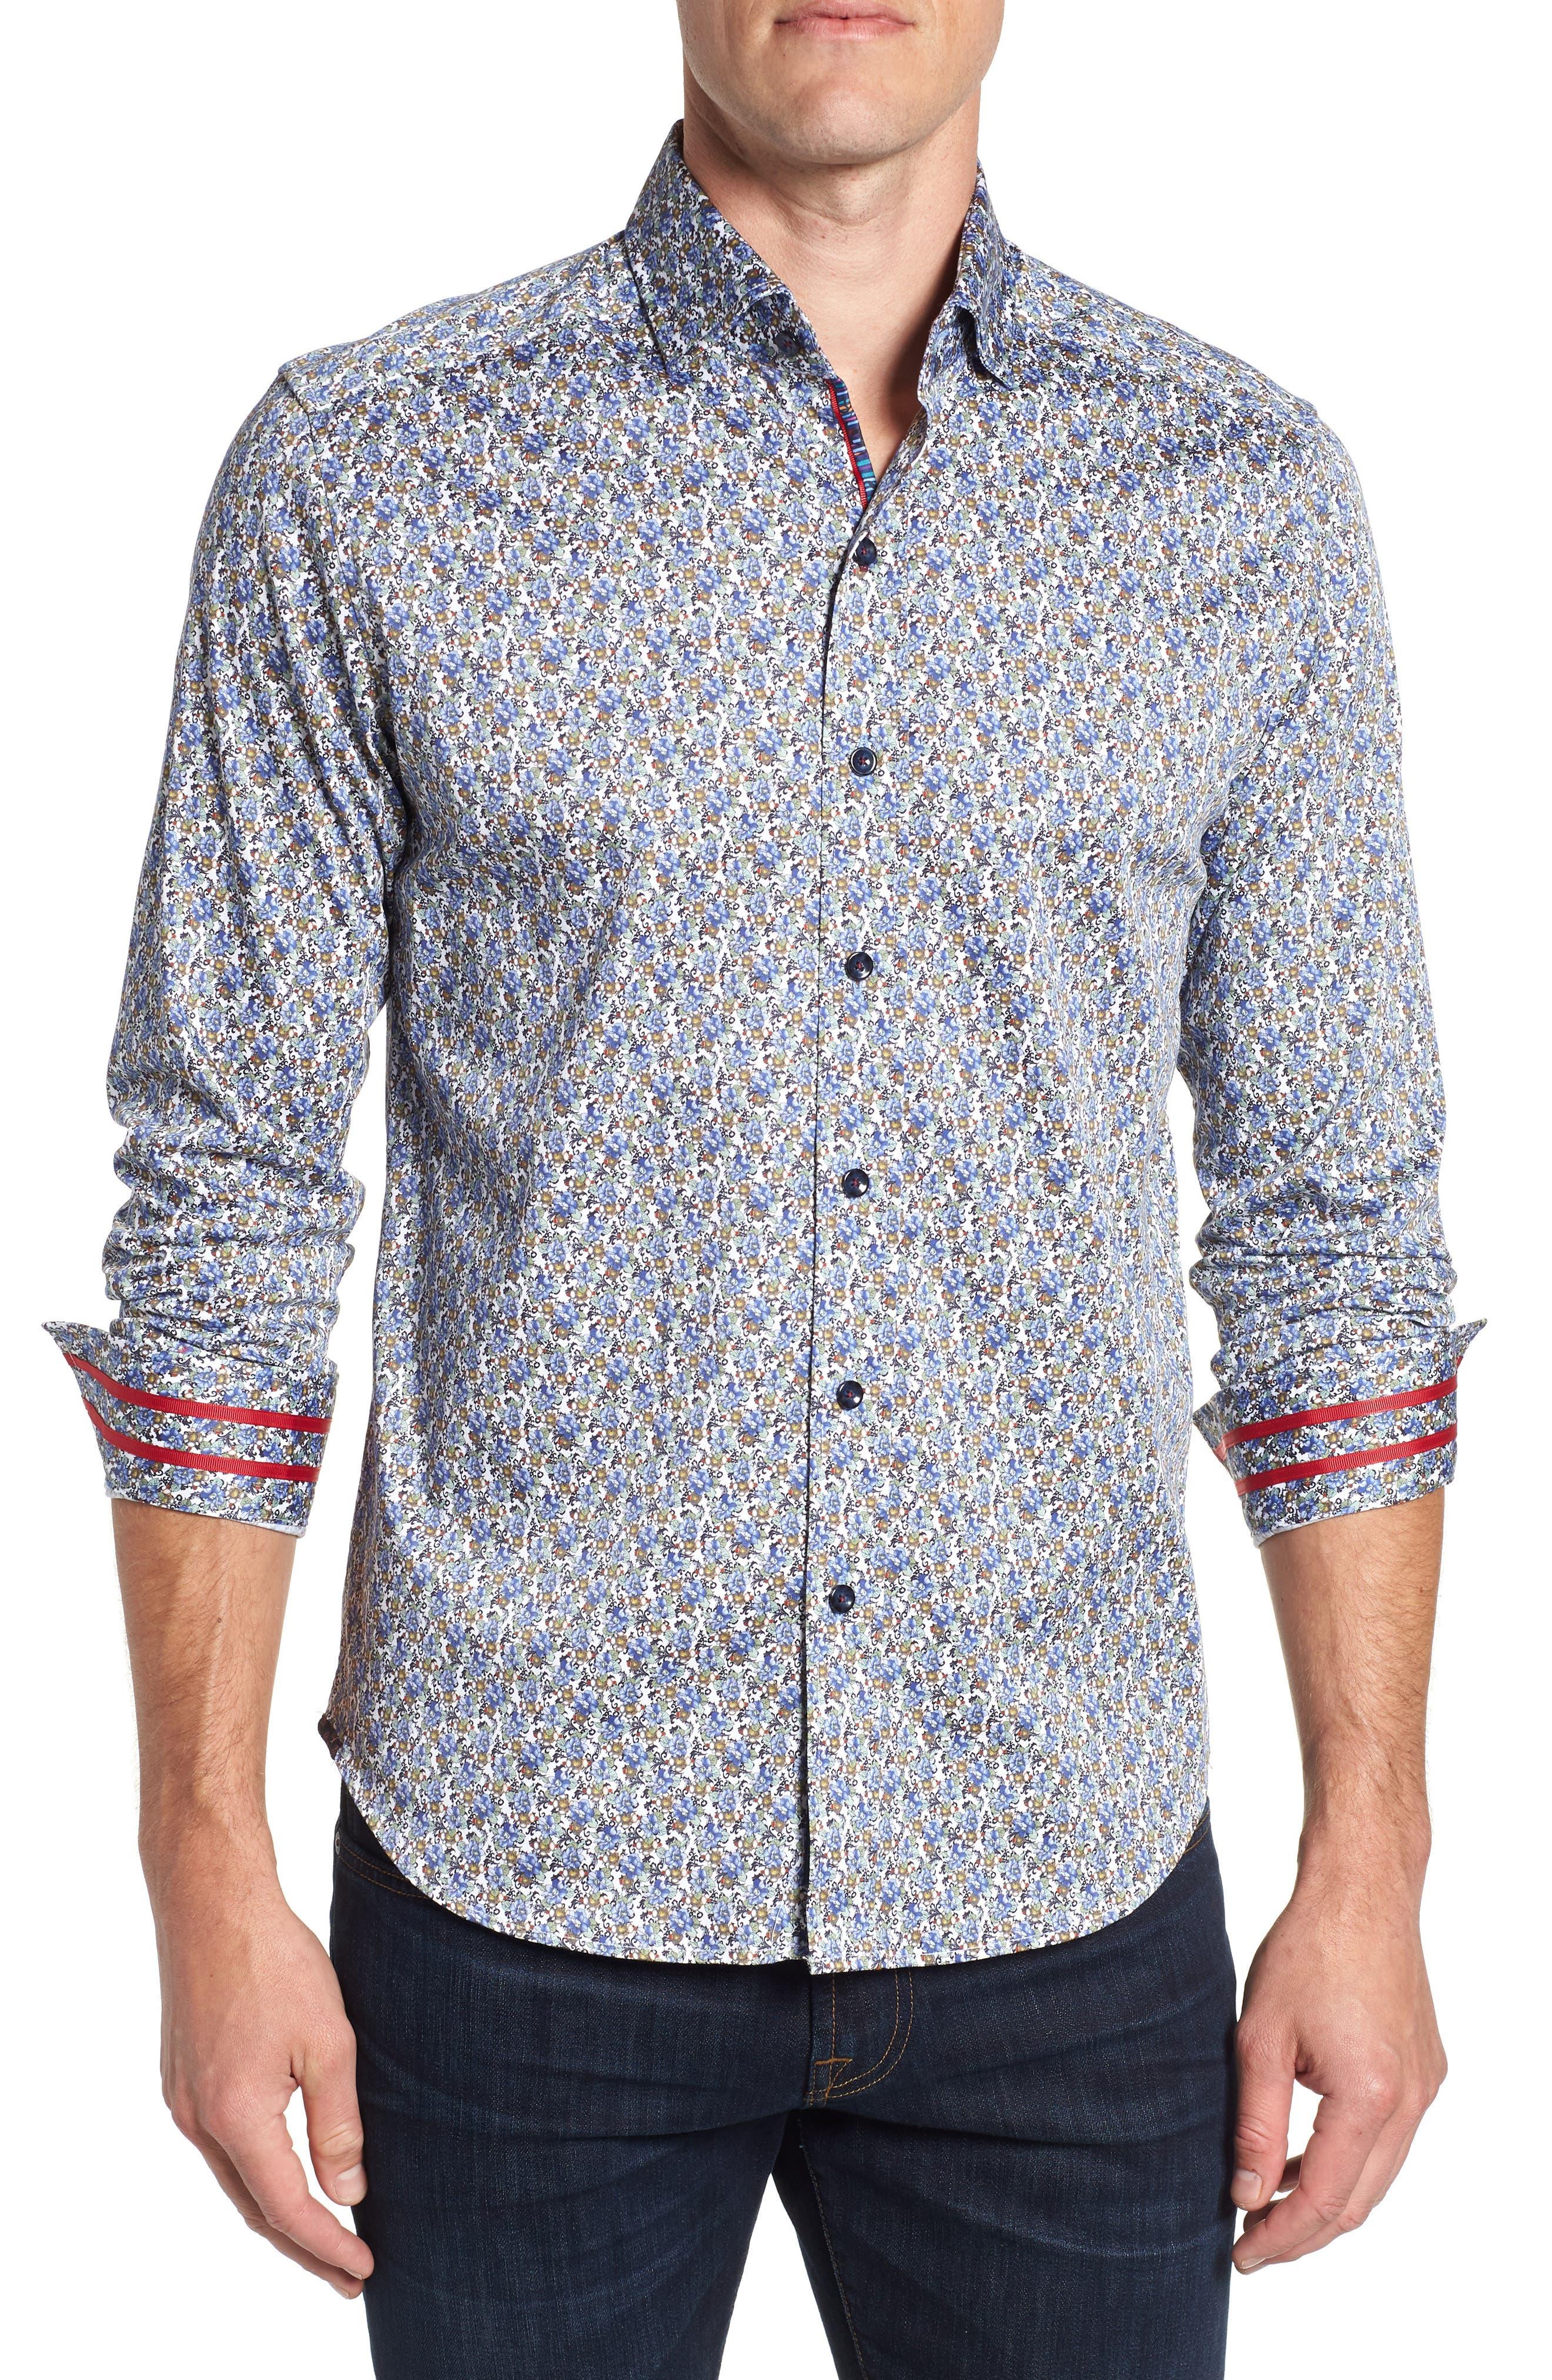 Richardson Tailored Fit Print Sport Shirt,                         Main,                         color, 400